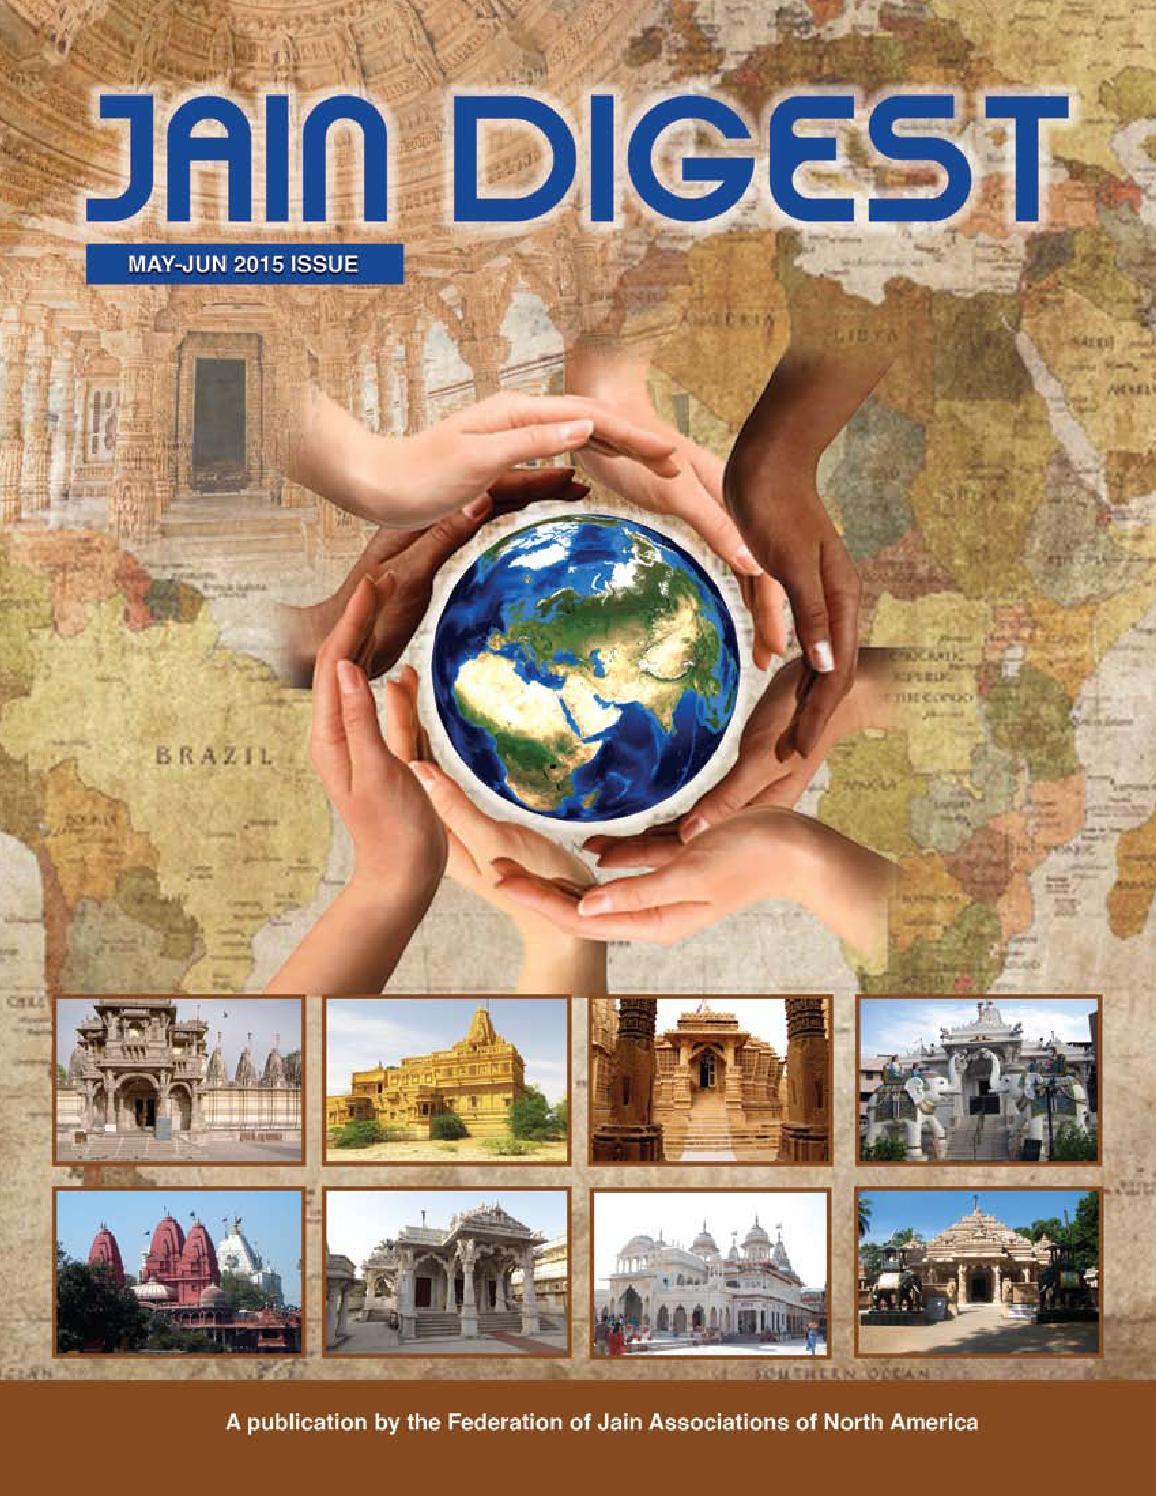 Jain Digest March - April - 2015 by Parth Savla - issuu